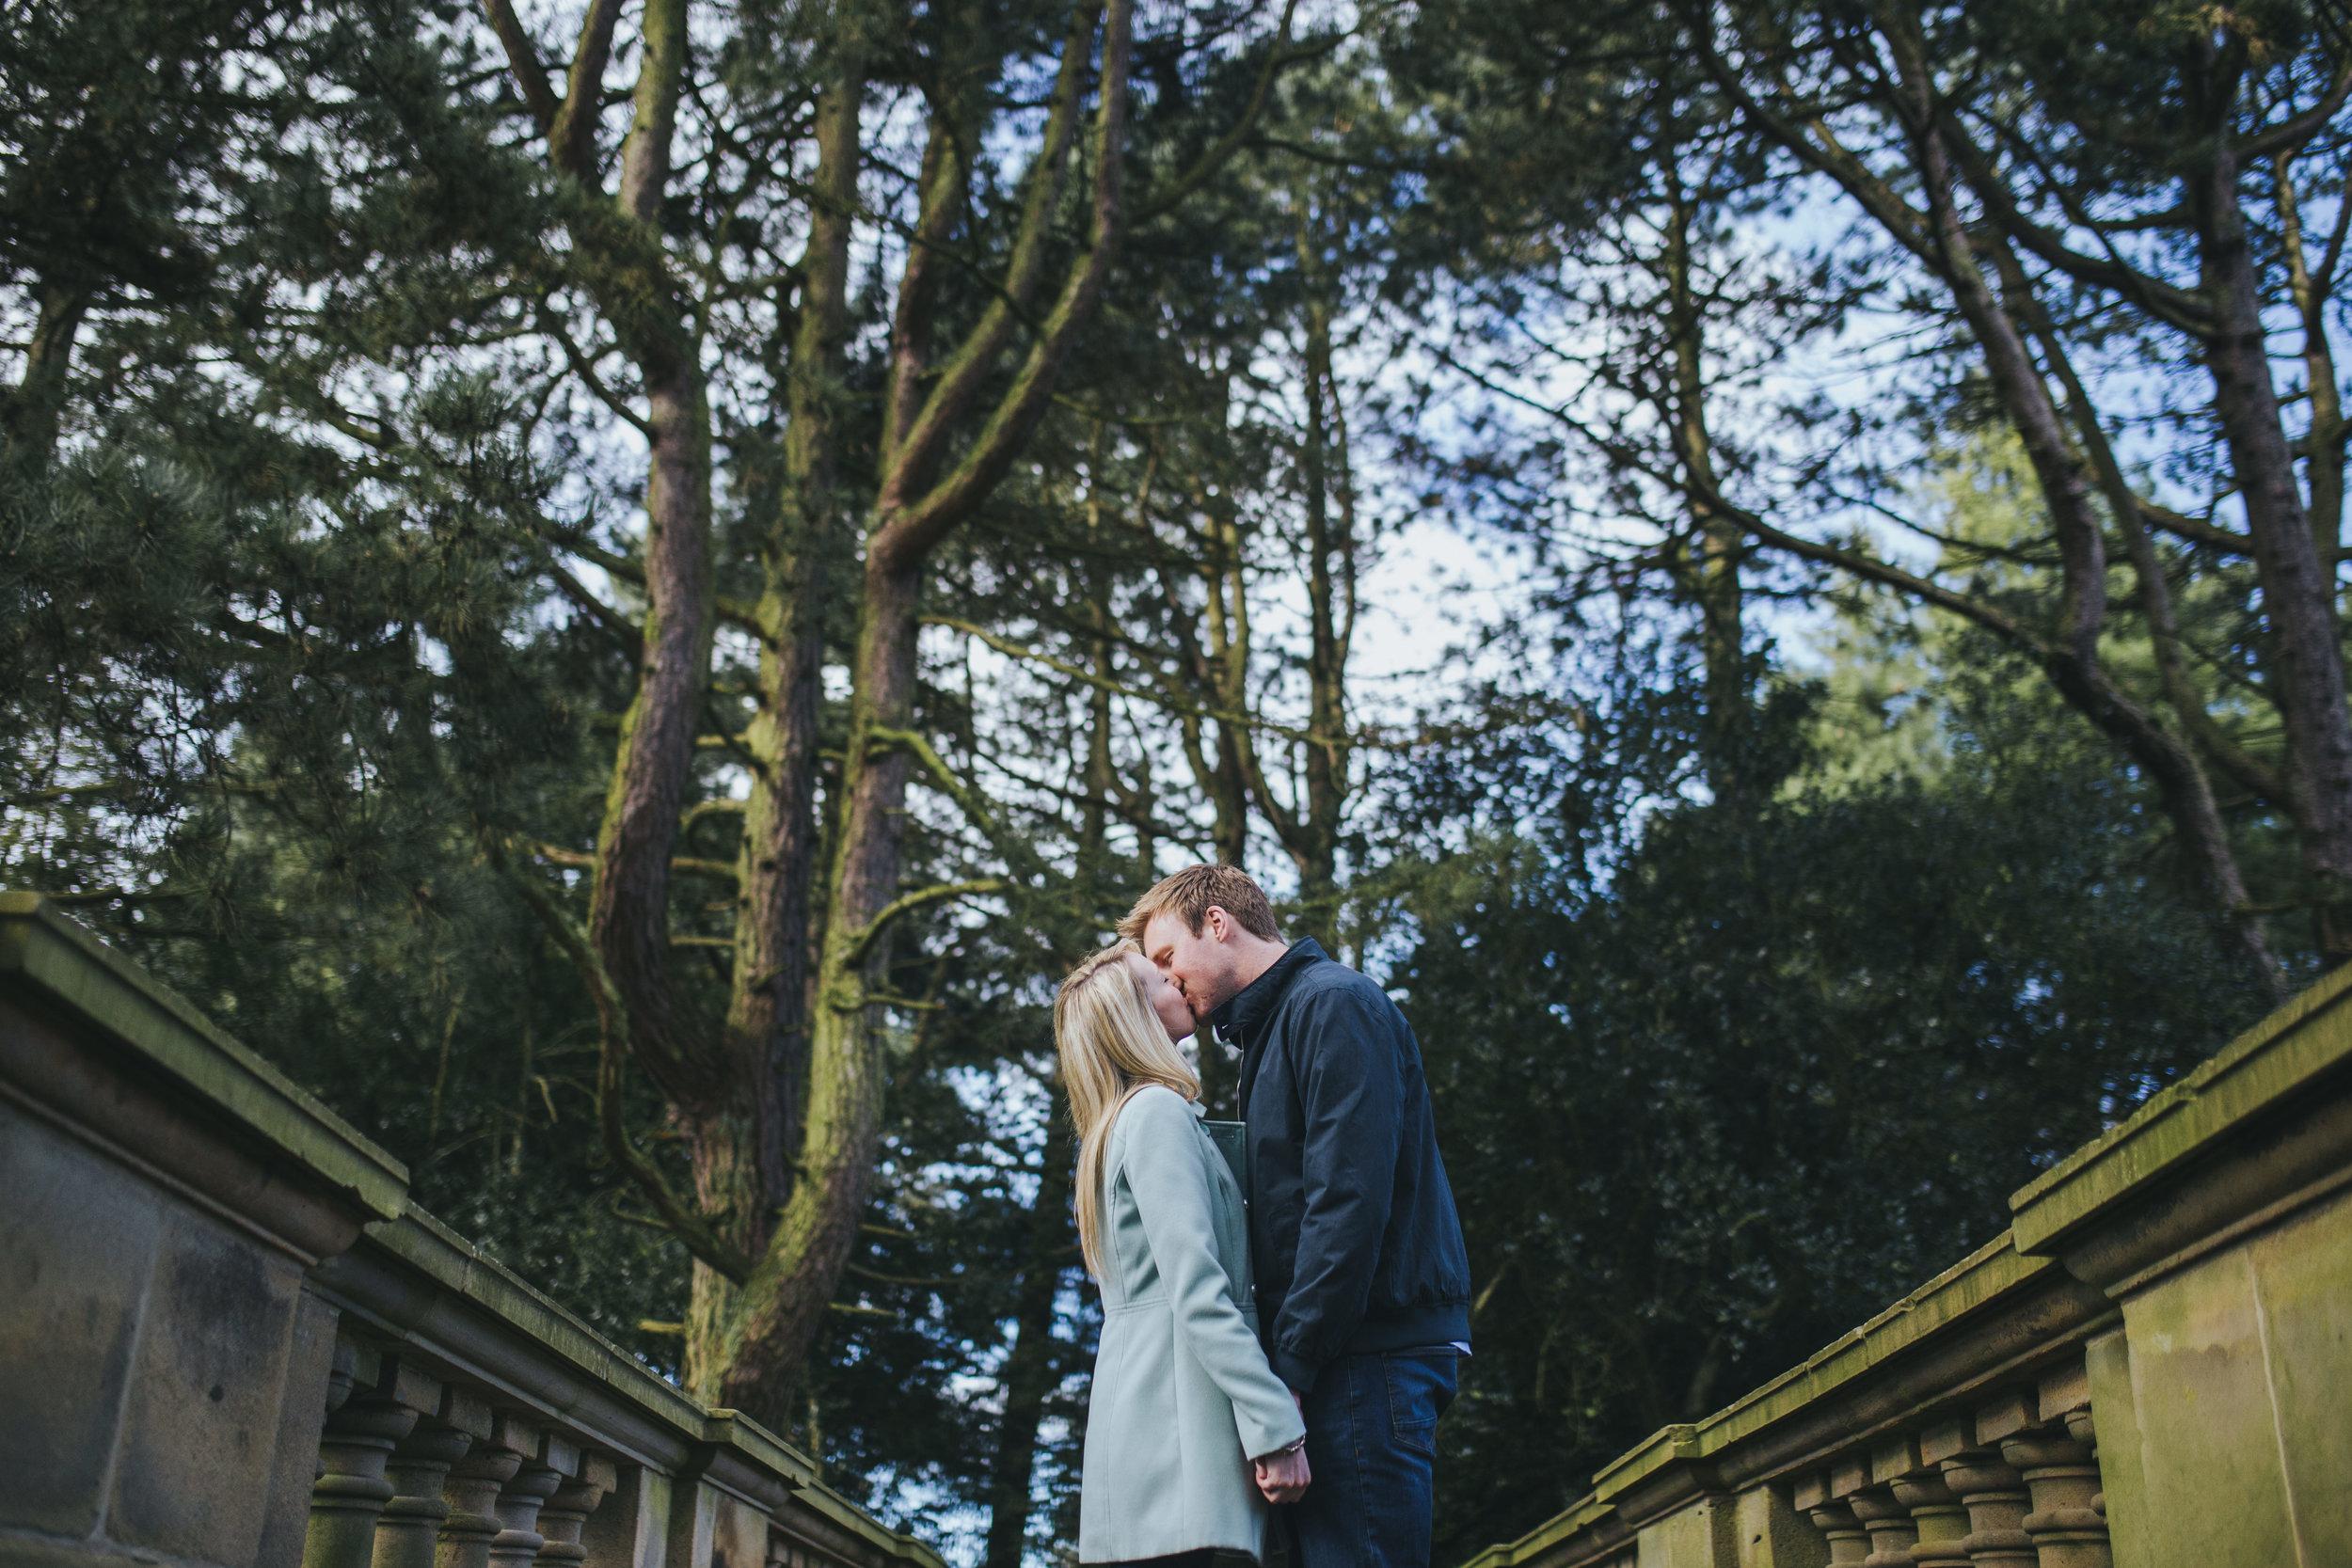 creative wedding photographs Lancashire - williamson park lancashire